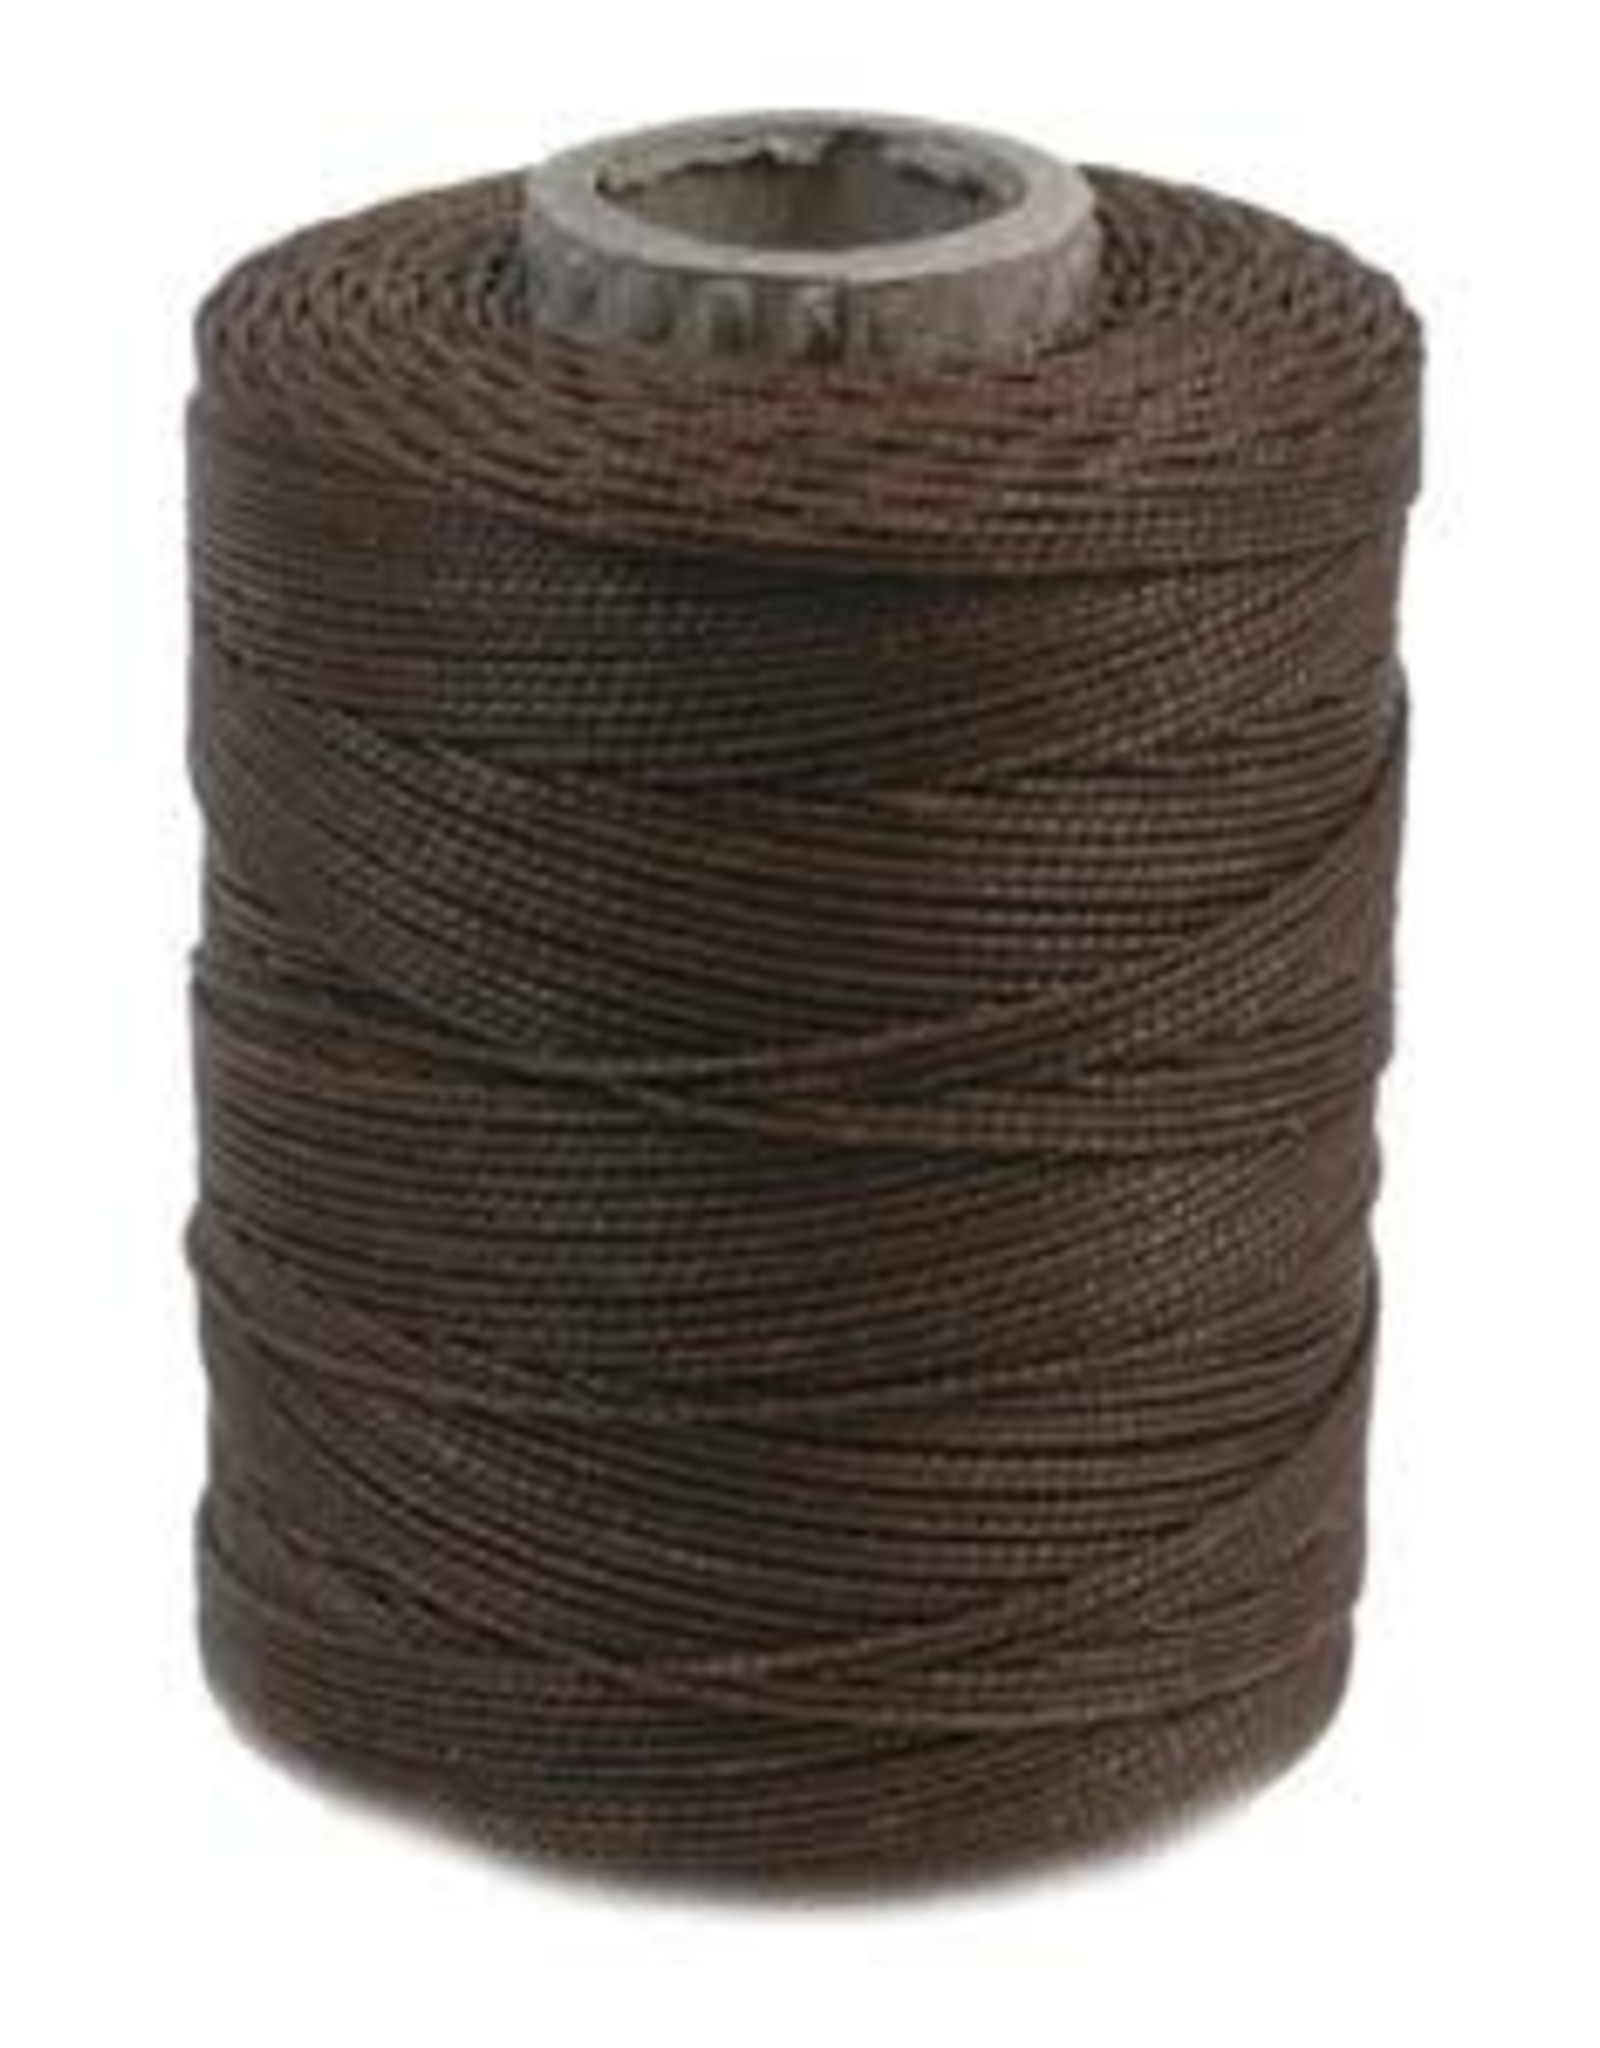 Wax Polyester Cord Brown ea